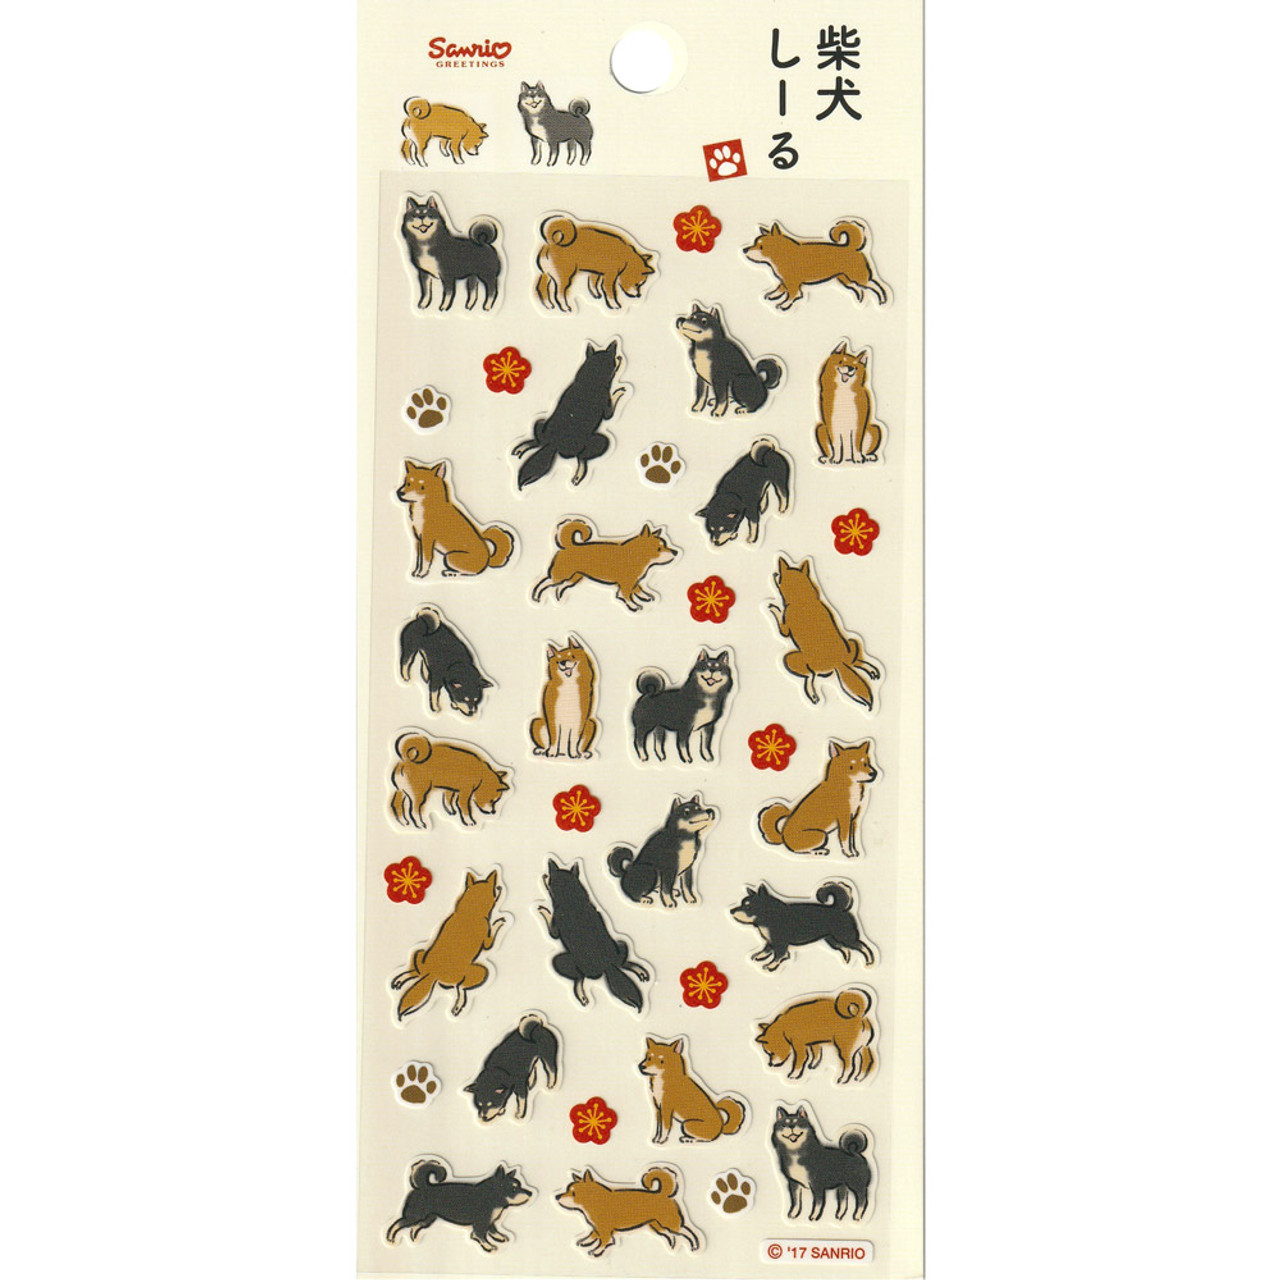 sanrio super cute shiba inu dog new years greetings sticker sheet